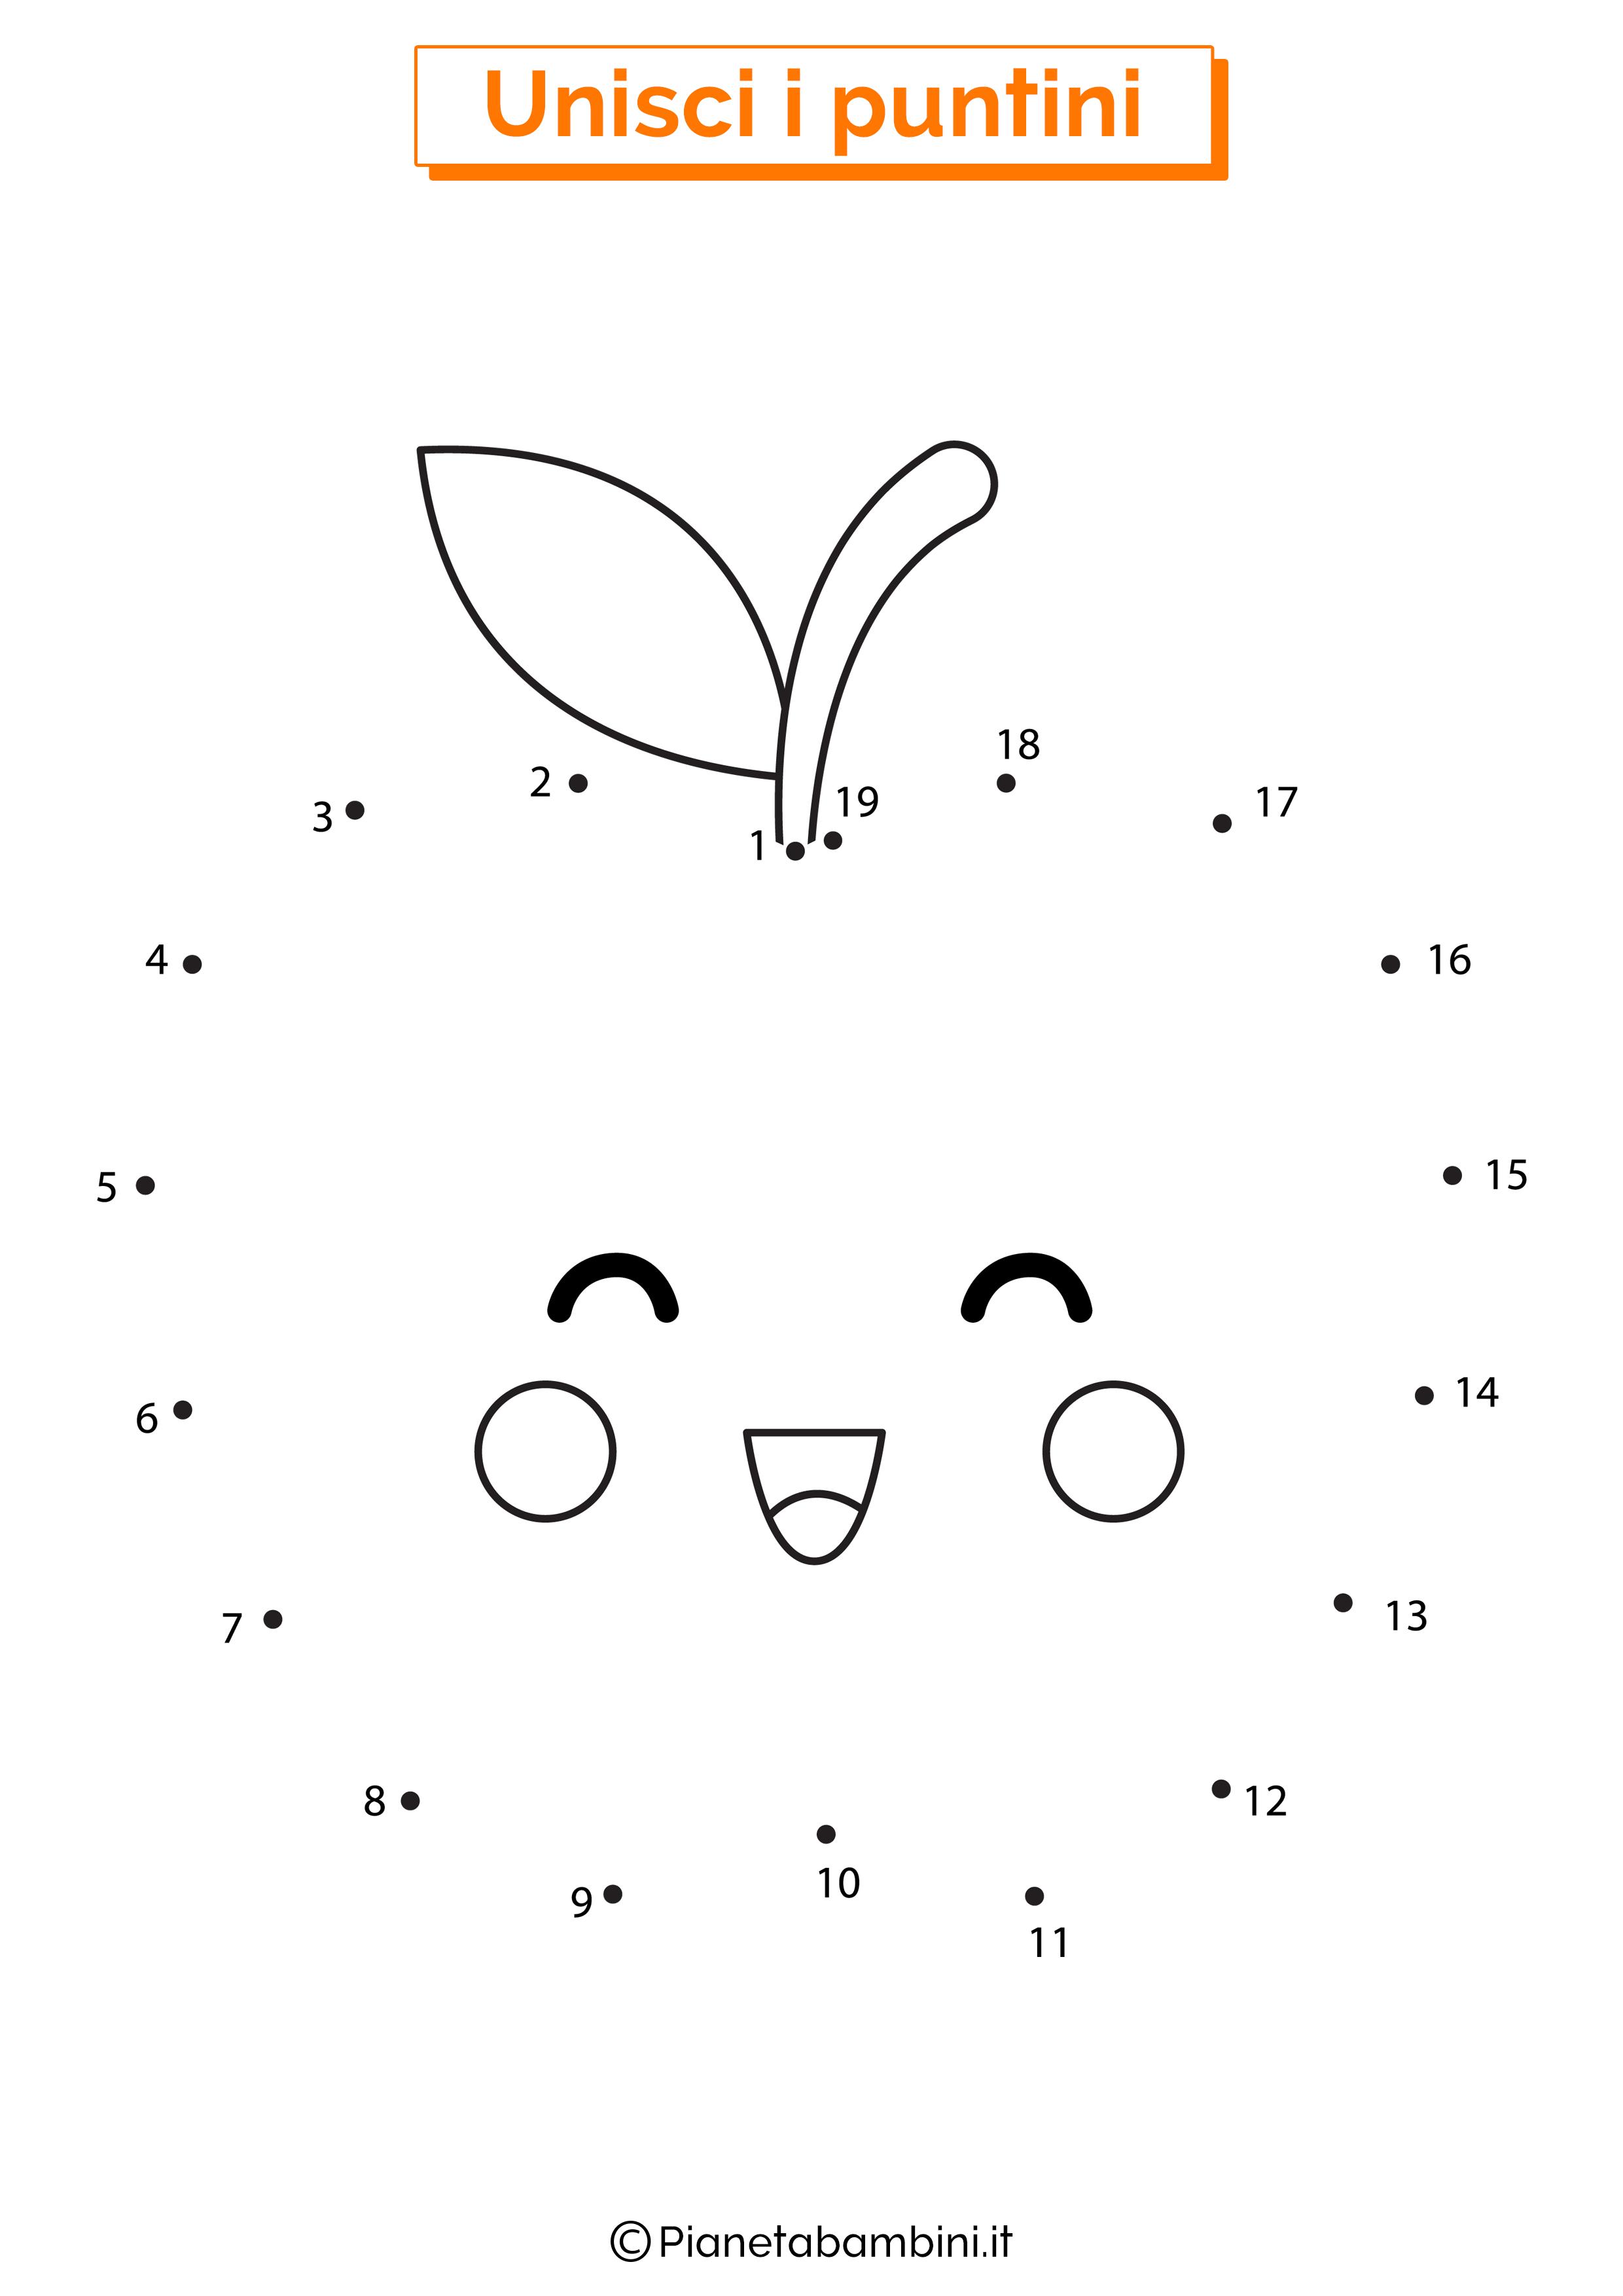 Disegno unisci i puntini mela